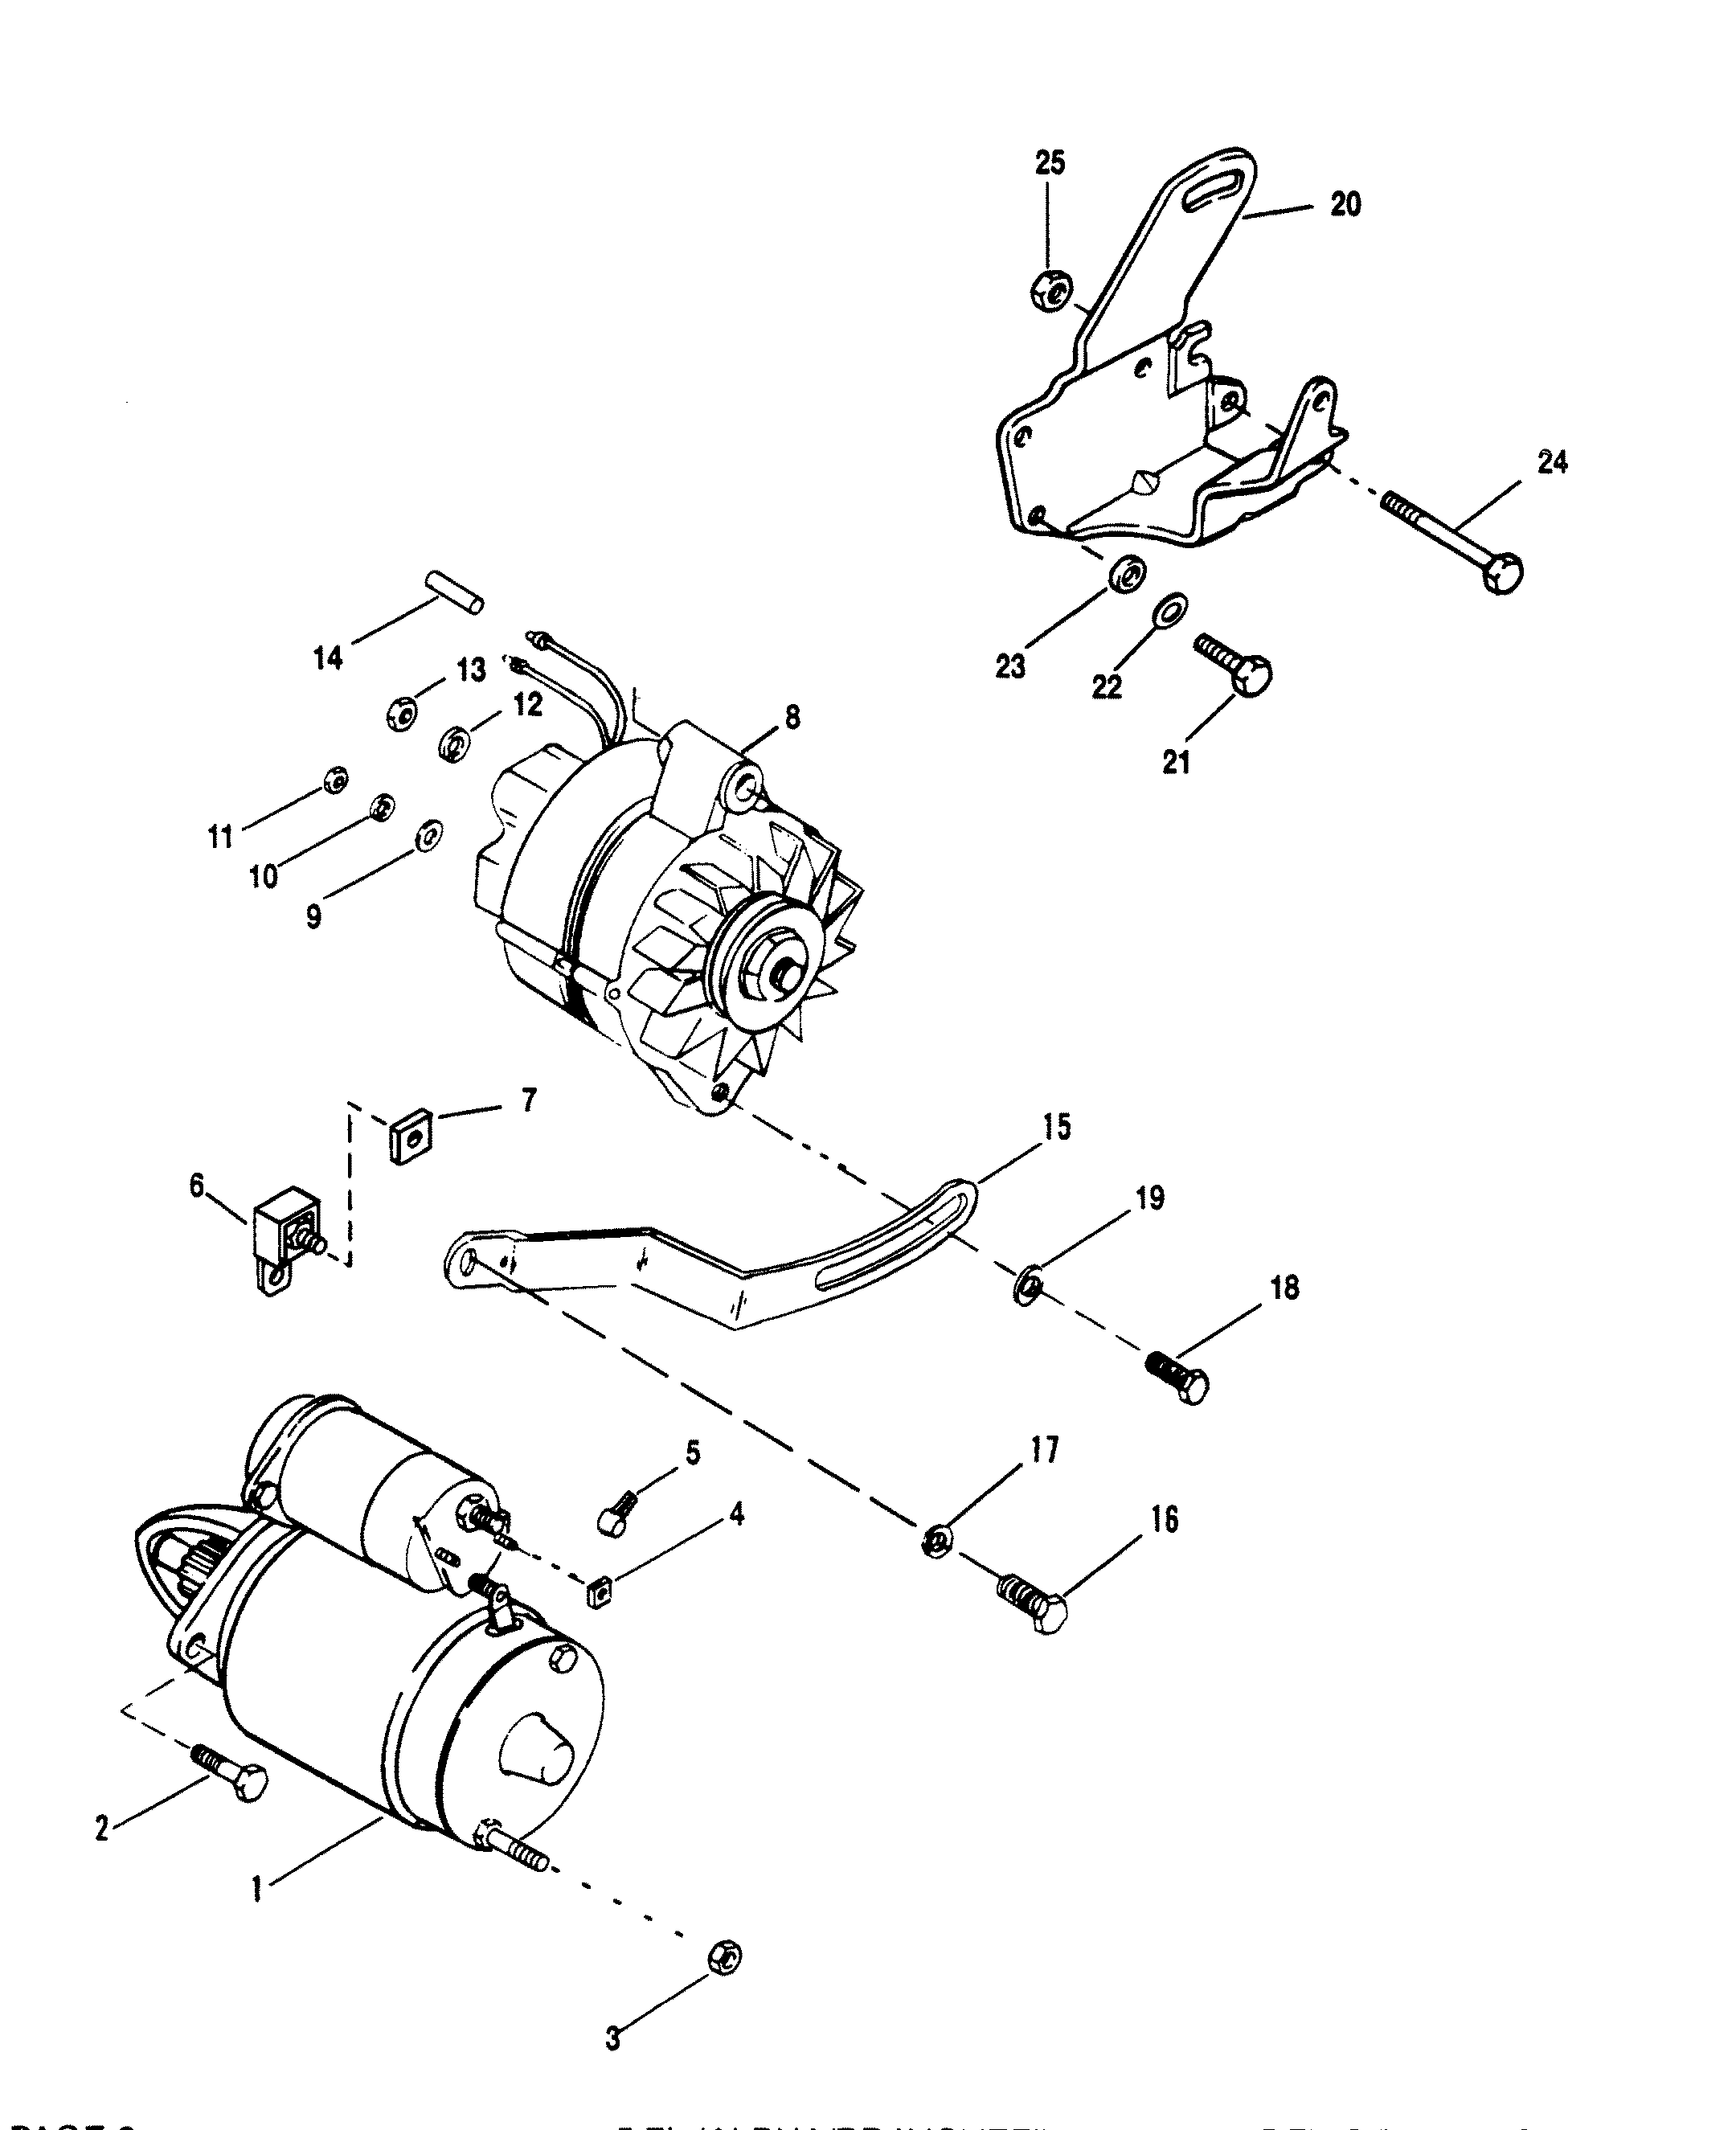 1997 Mercruiser 5 7 Starter Wiring Great Installation Of Trim Motor Diagram And Alternator For 7l Alpha Efi